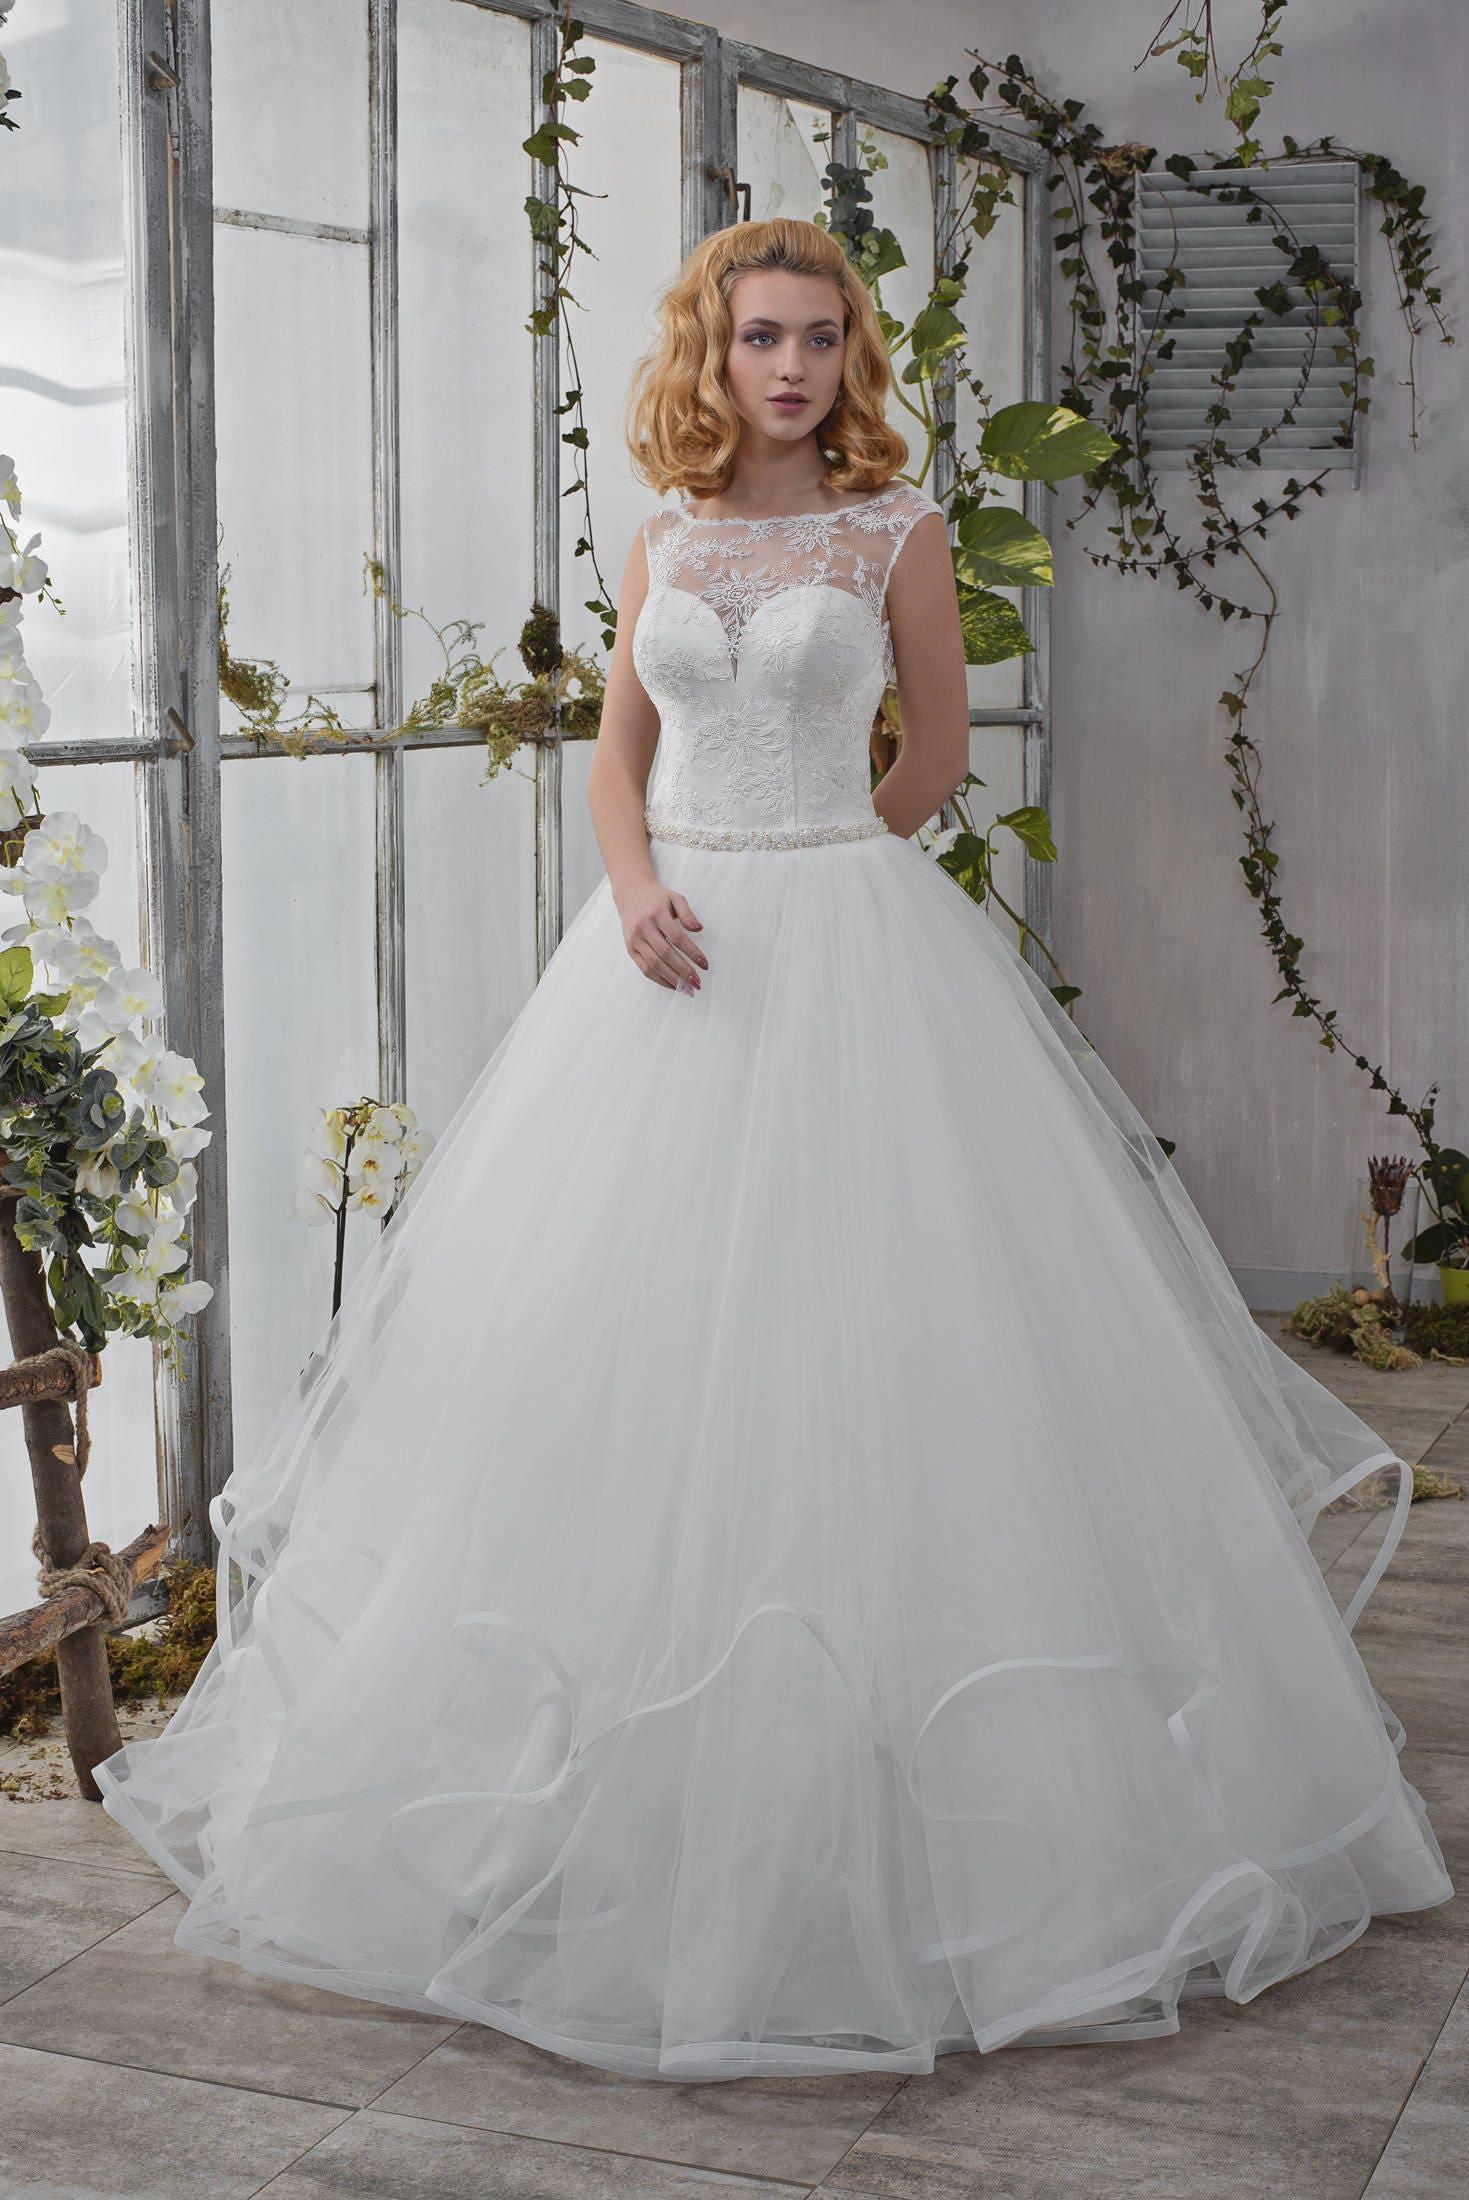 Wedding Dress Romantic Wellen Rock Hochzeitskleid Brautkleid